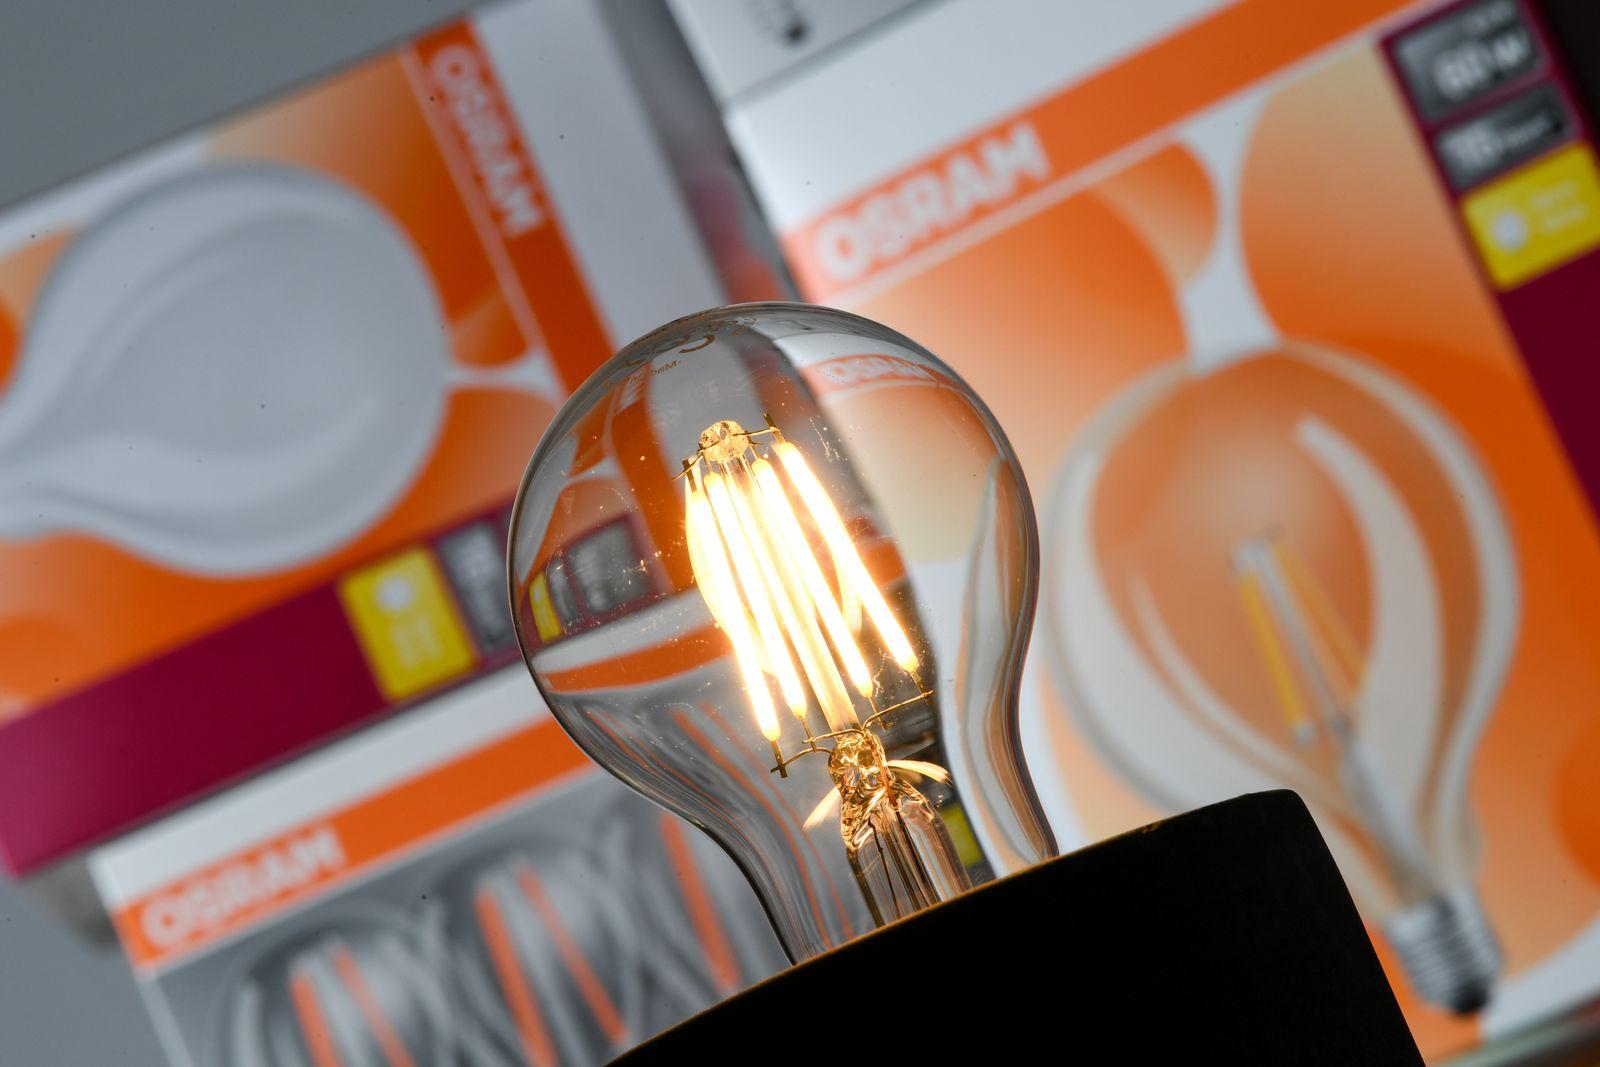 A lit bulb by German lighting manufacturer Osram